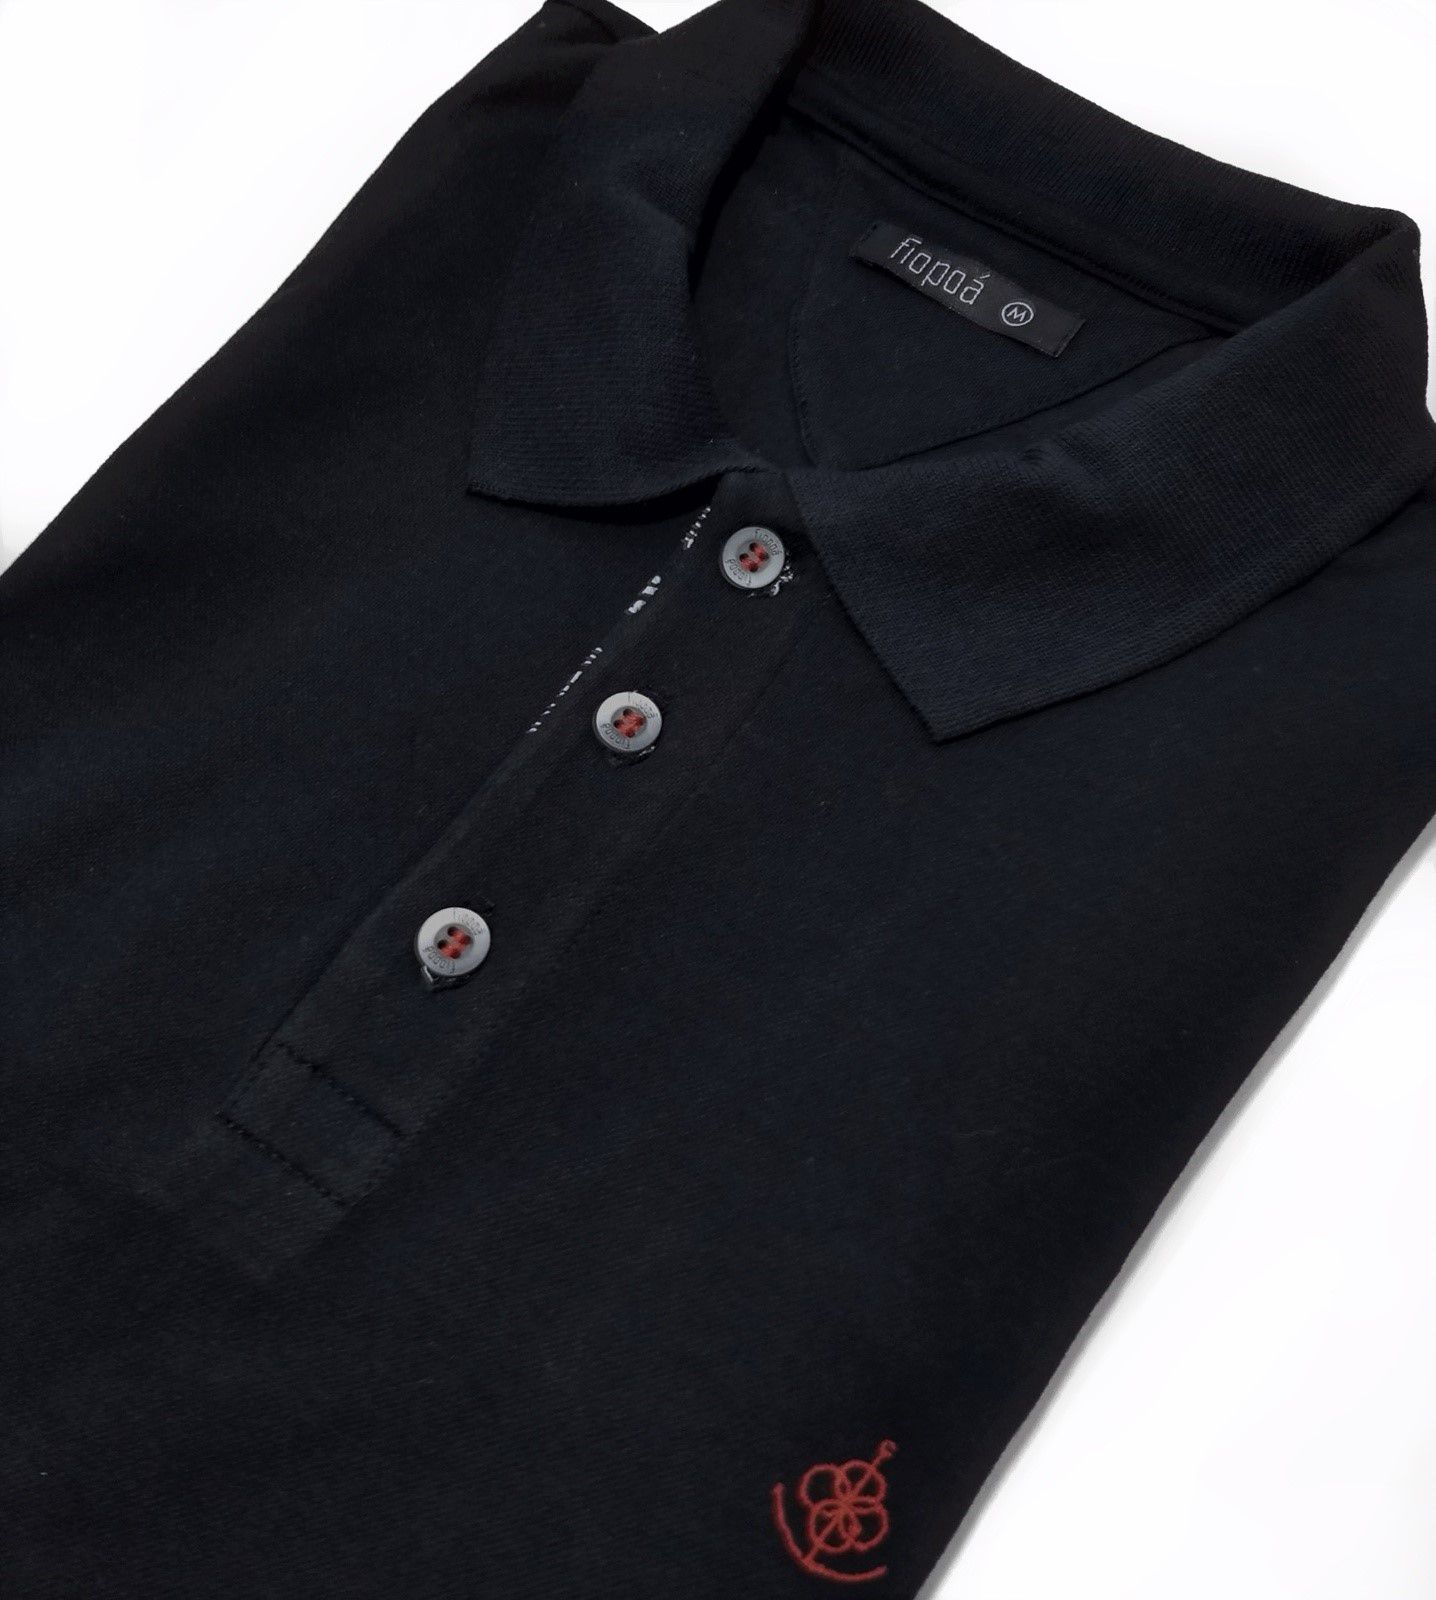 c280dd7bbf Camisa Polo Masculina Preta Detalhe Musica. Image description · Image  description · Image description · Image description